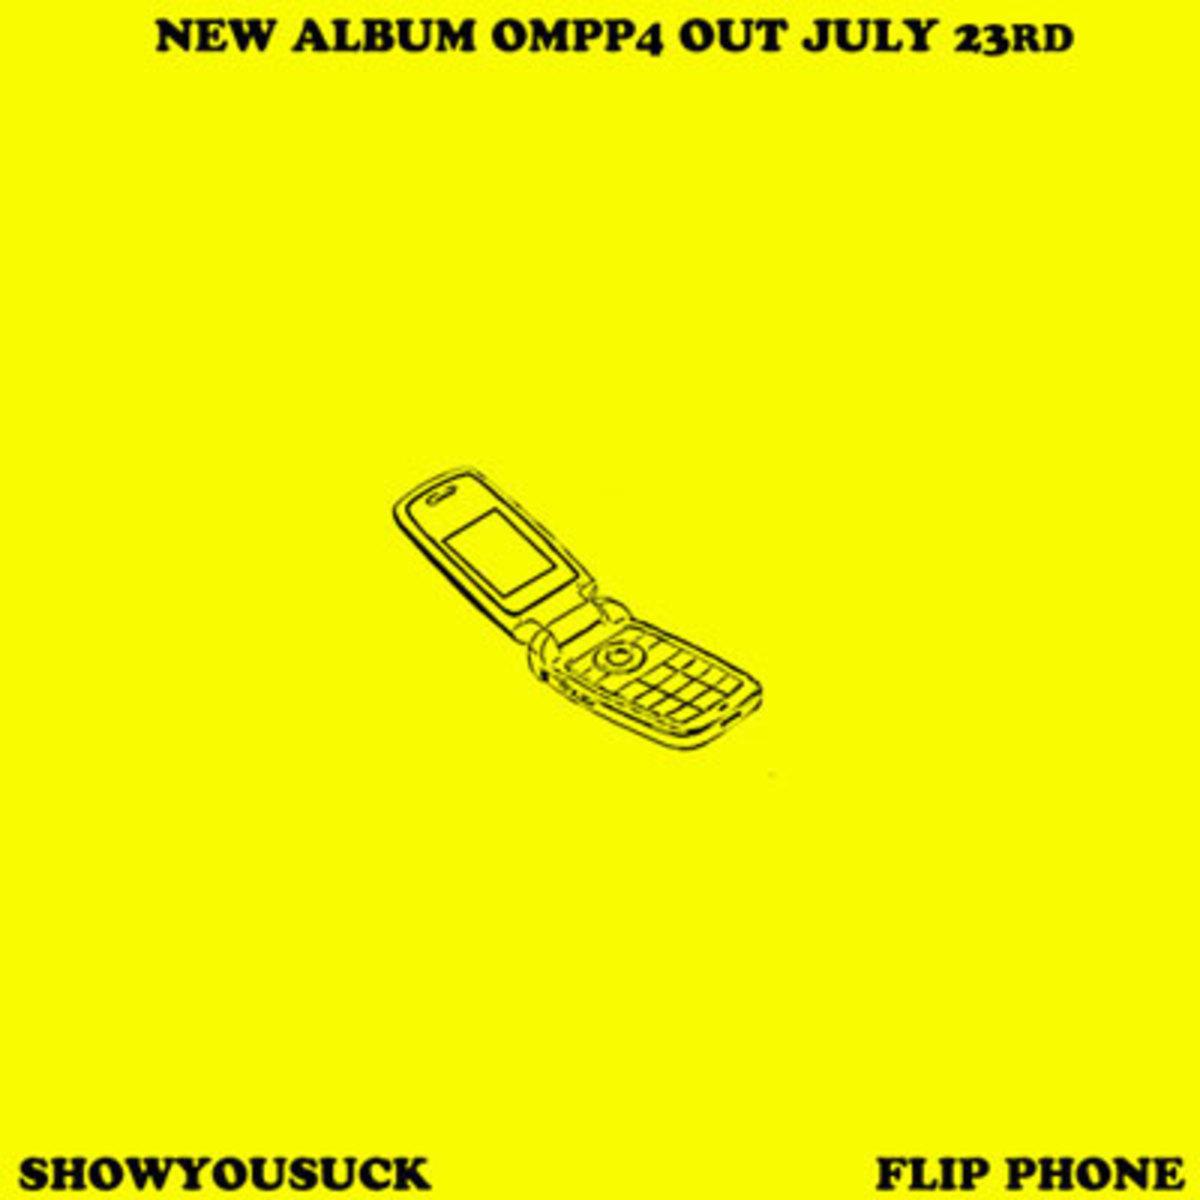 showyousuck-flipphone.jpg